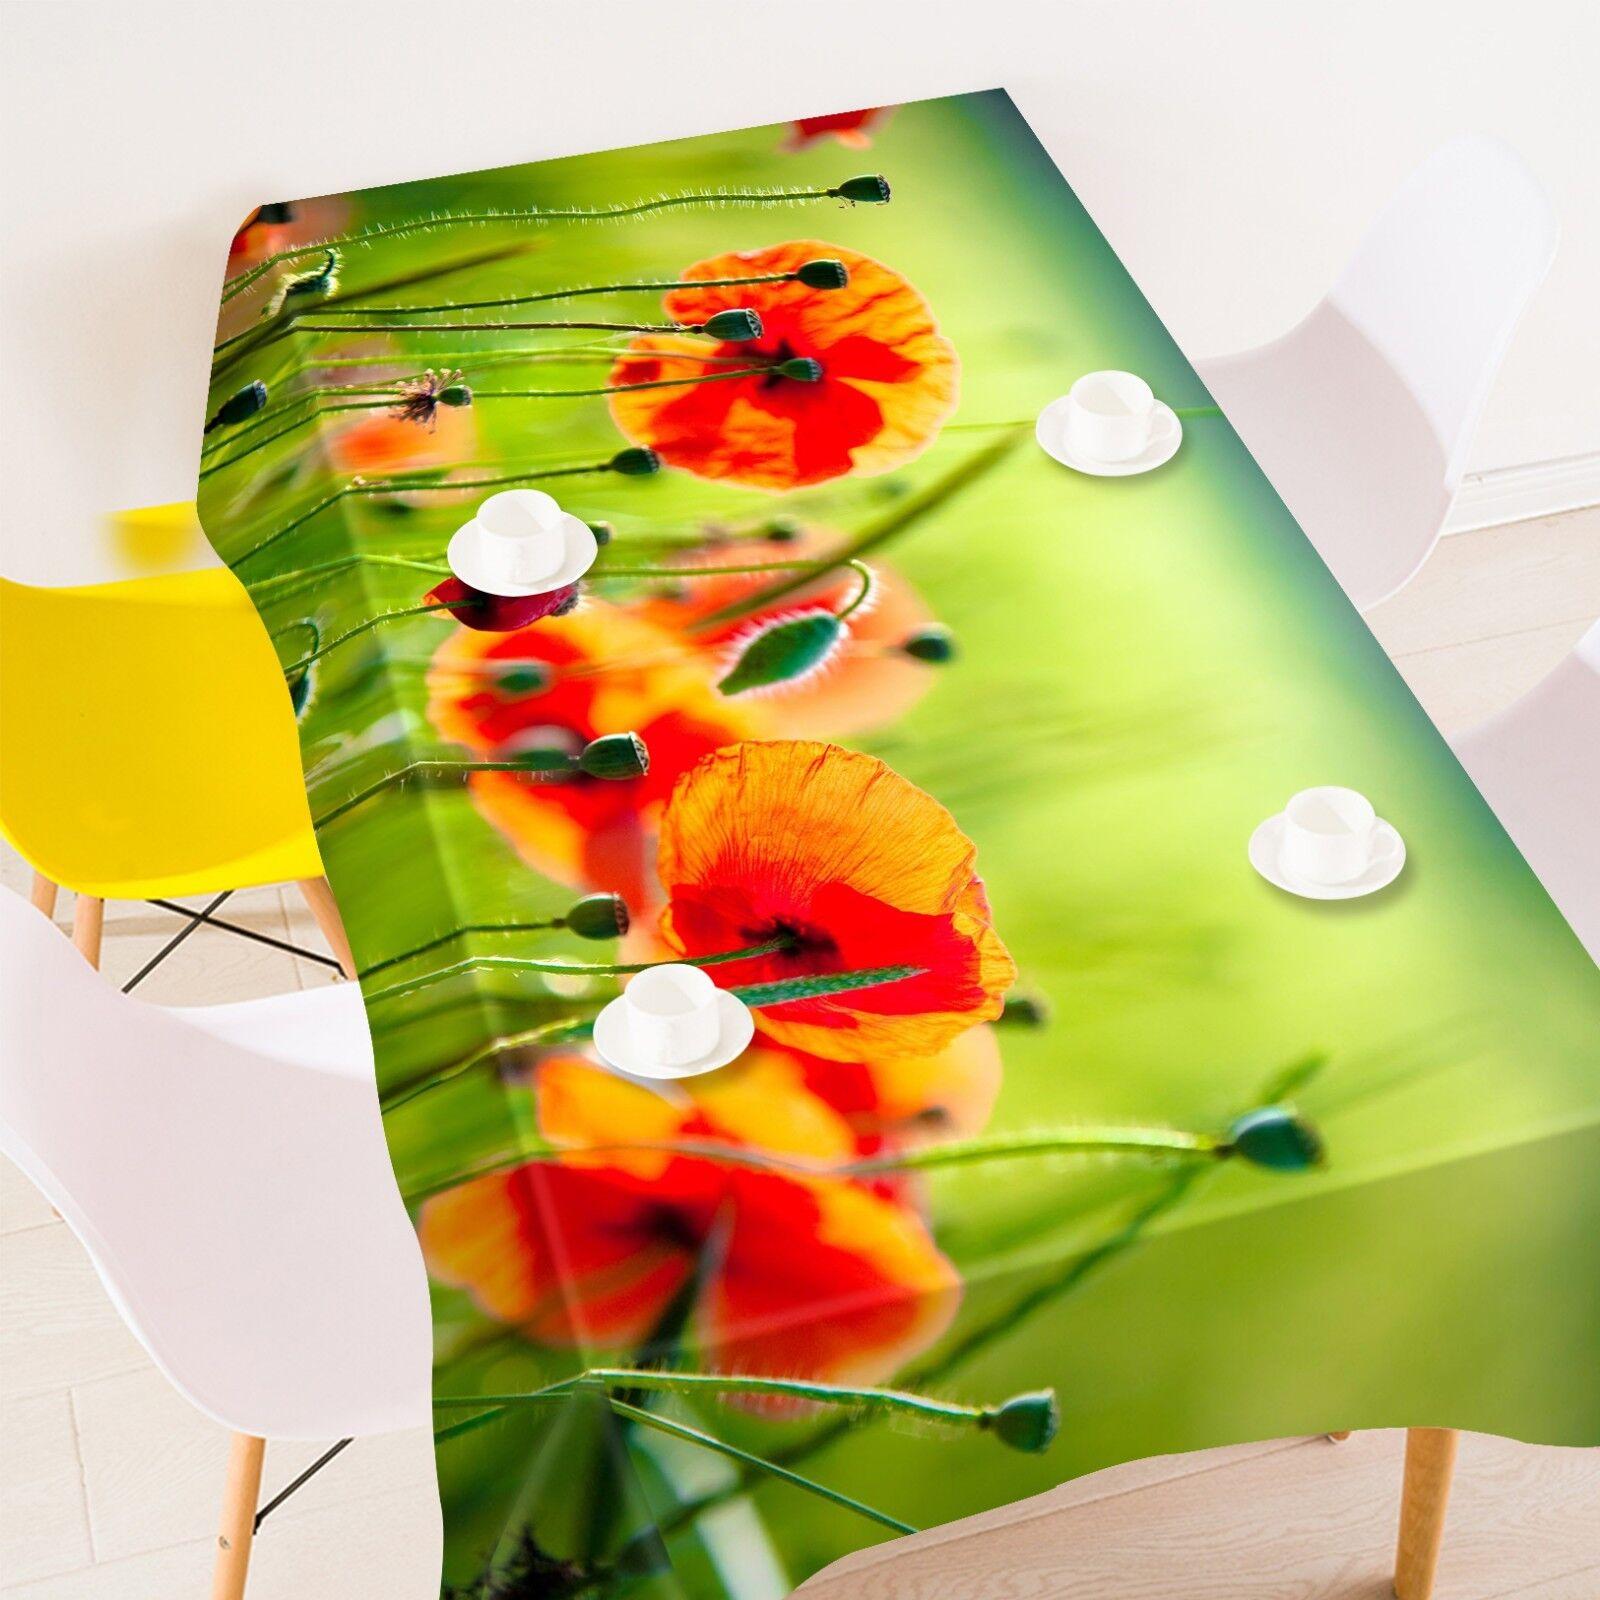 3D Farm Flowers 124 Tablecloth Table Cover Cloth Birthday Party Event AJ Summer